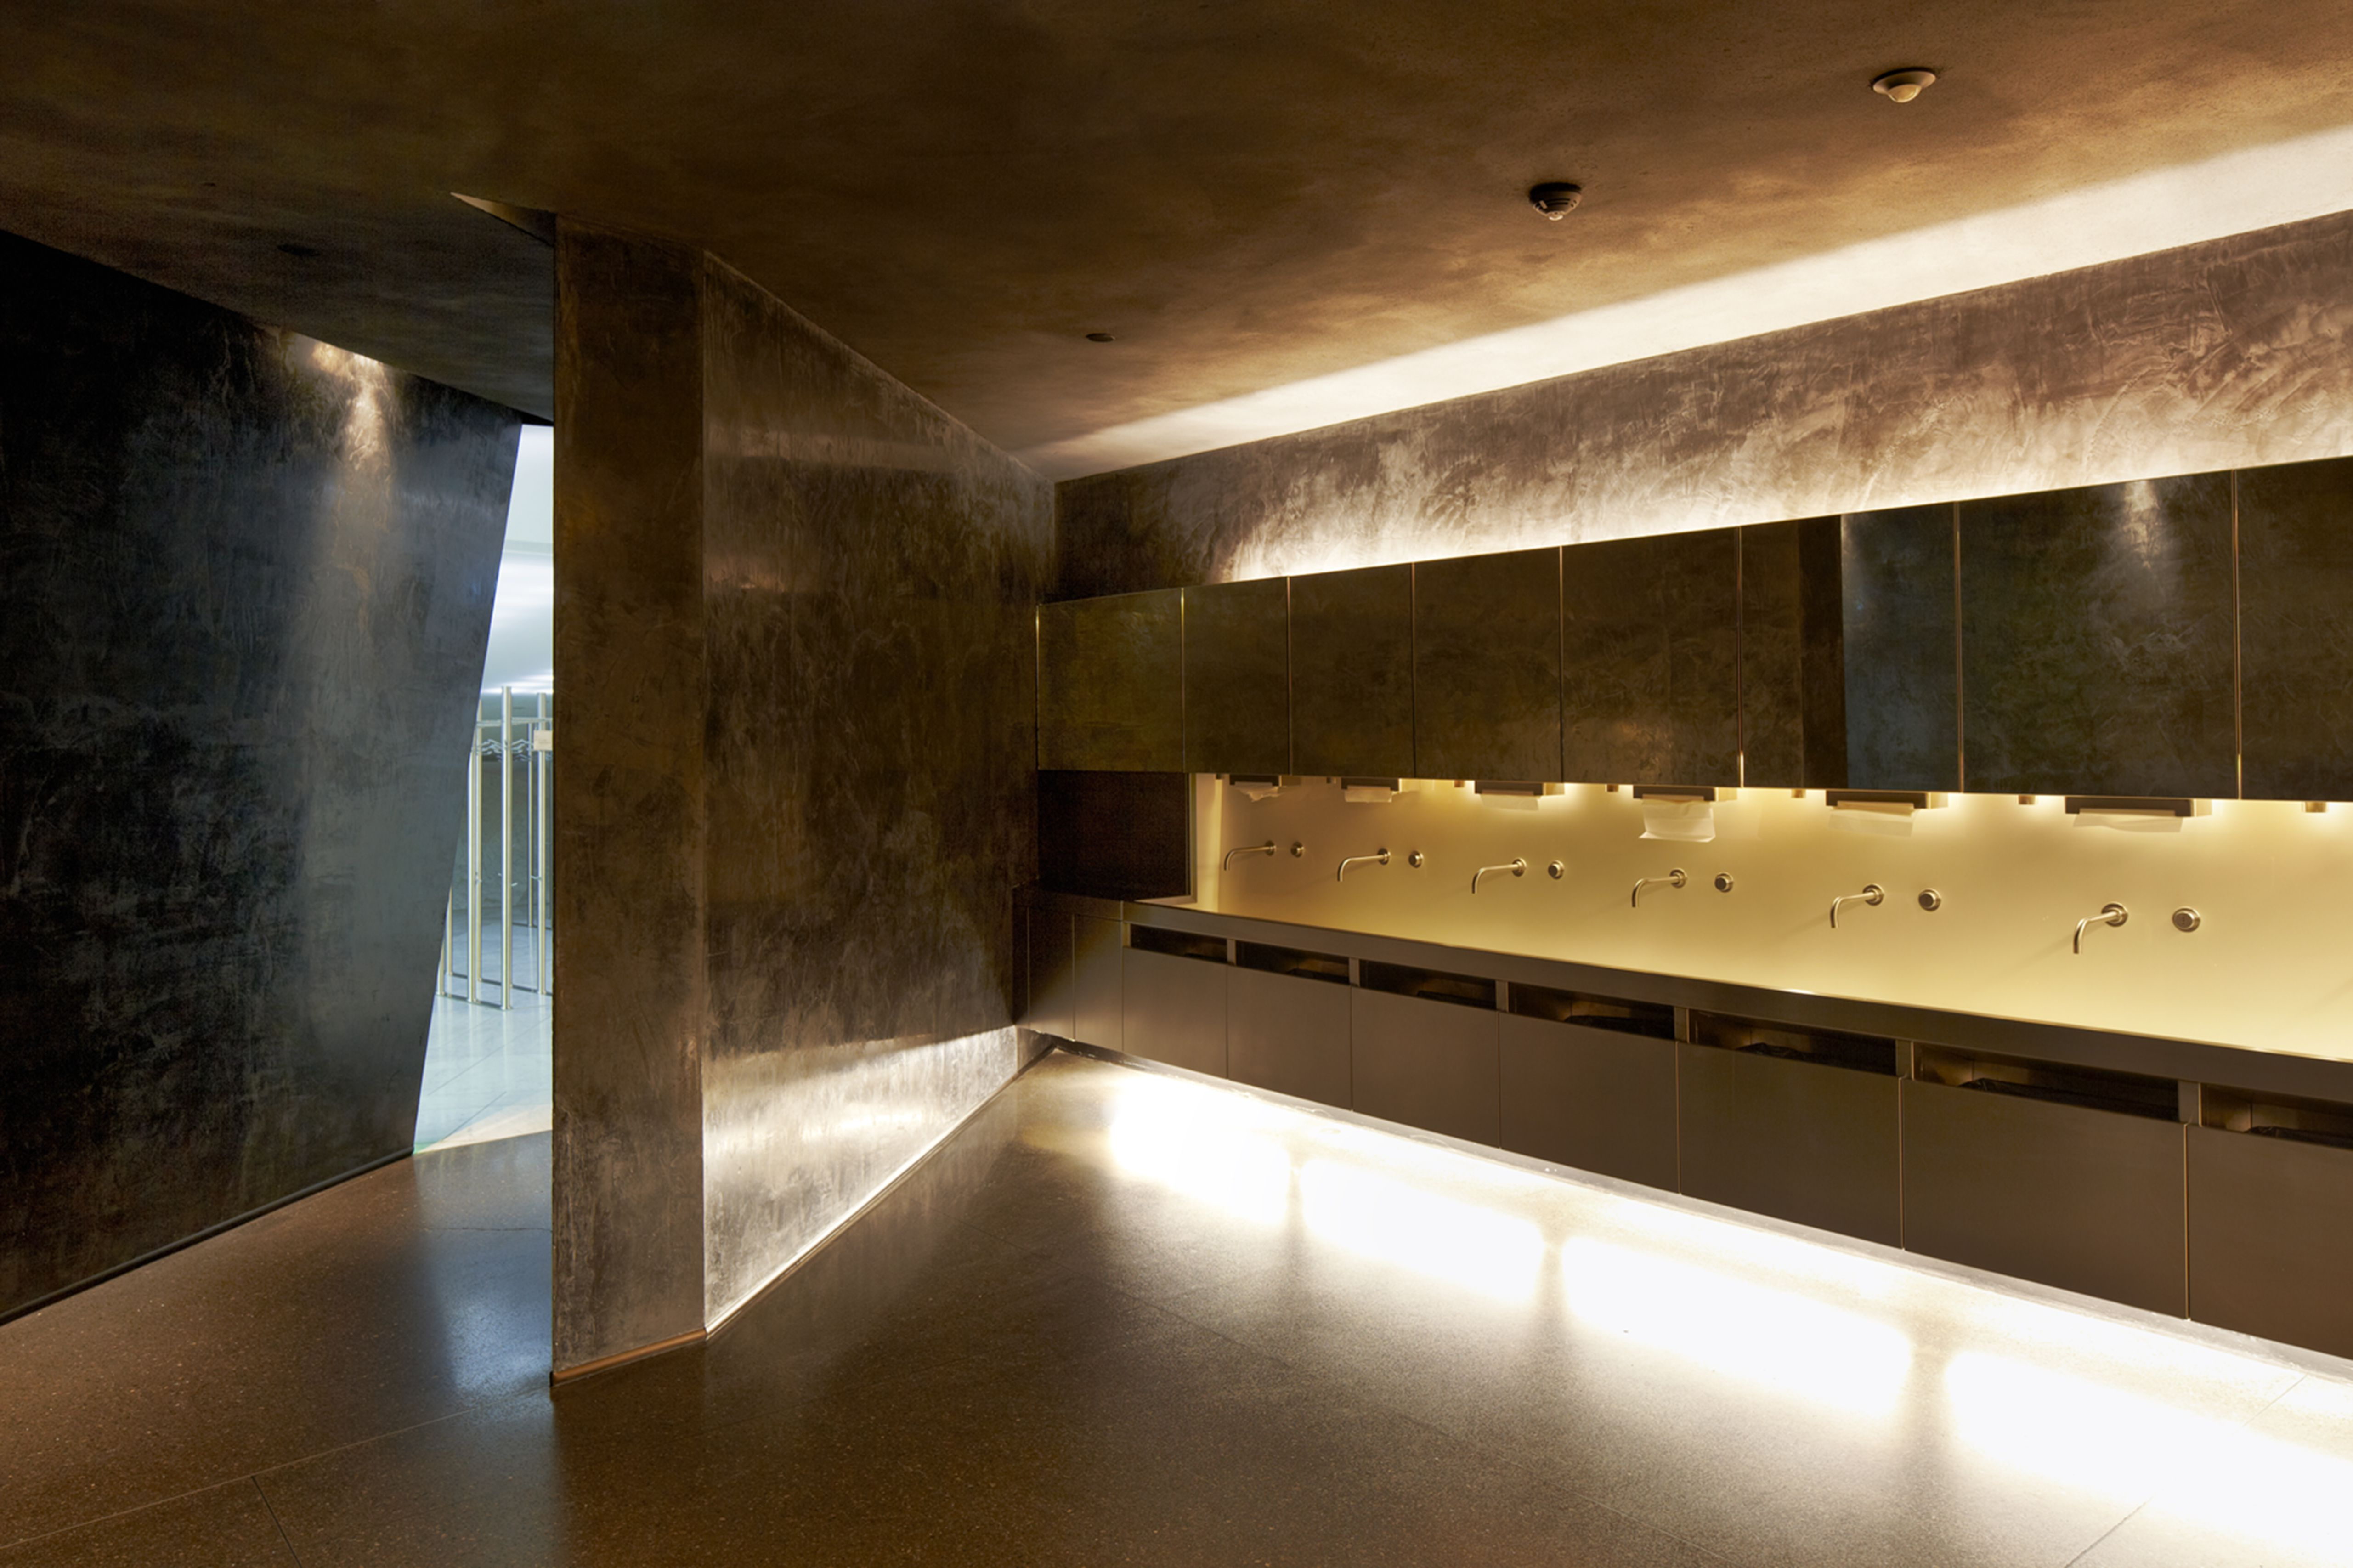 Men's Toilet Area in the Oslo Opera House